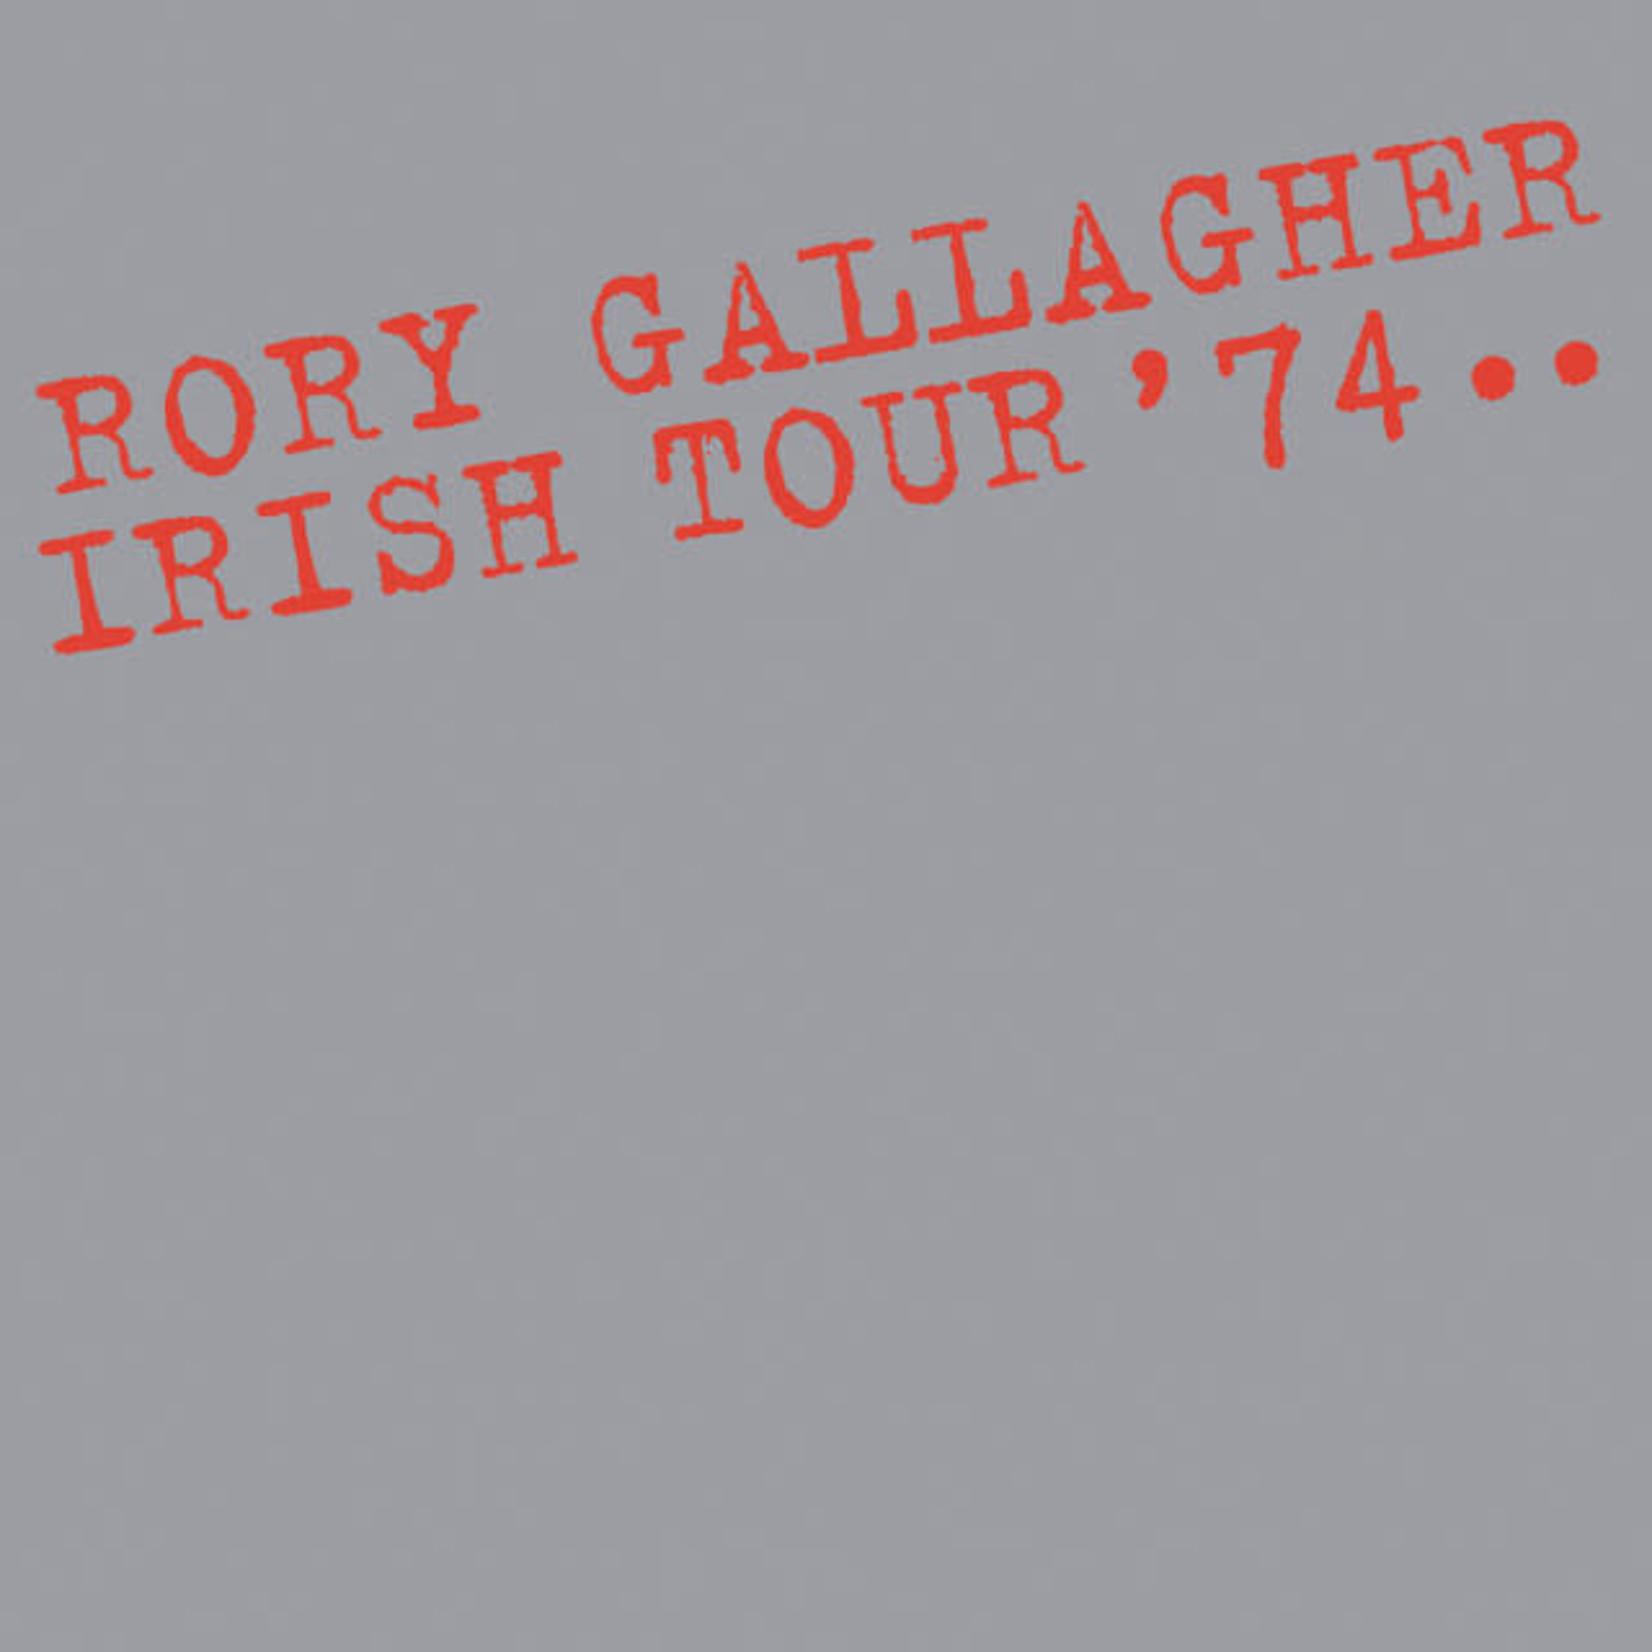 Vinyl Rory Gallagher - Irish Tour 74